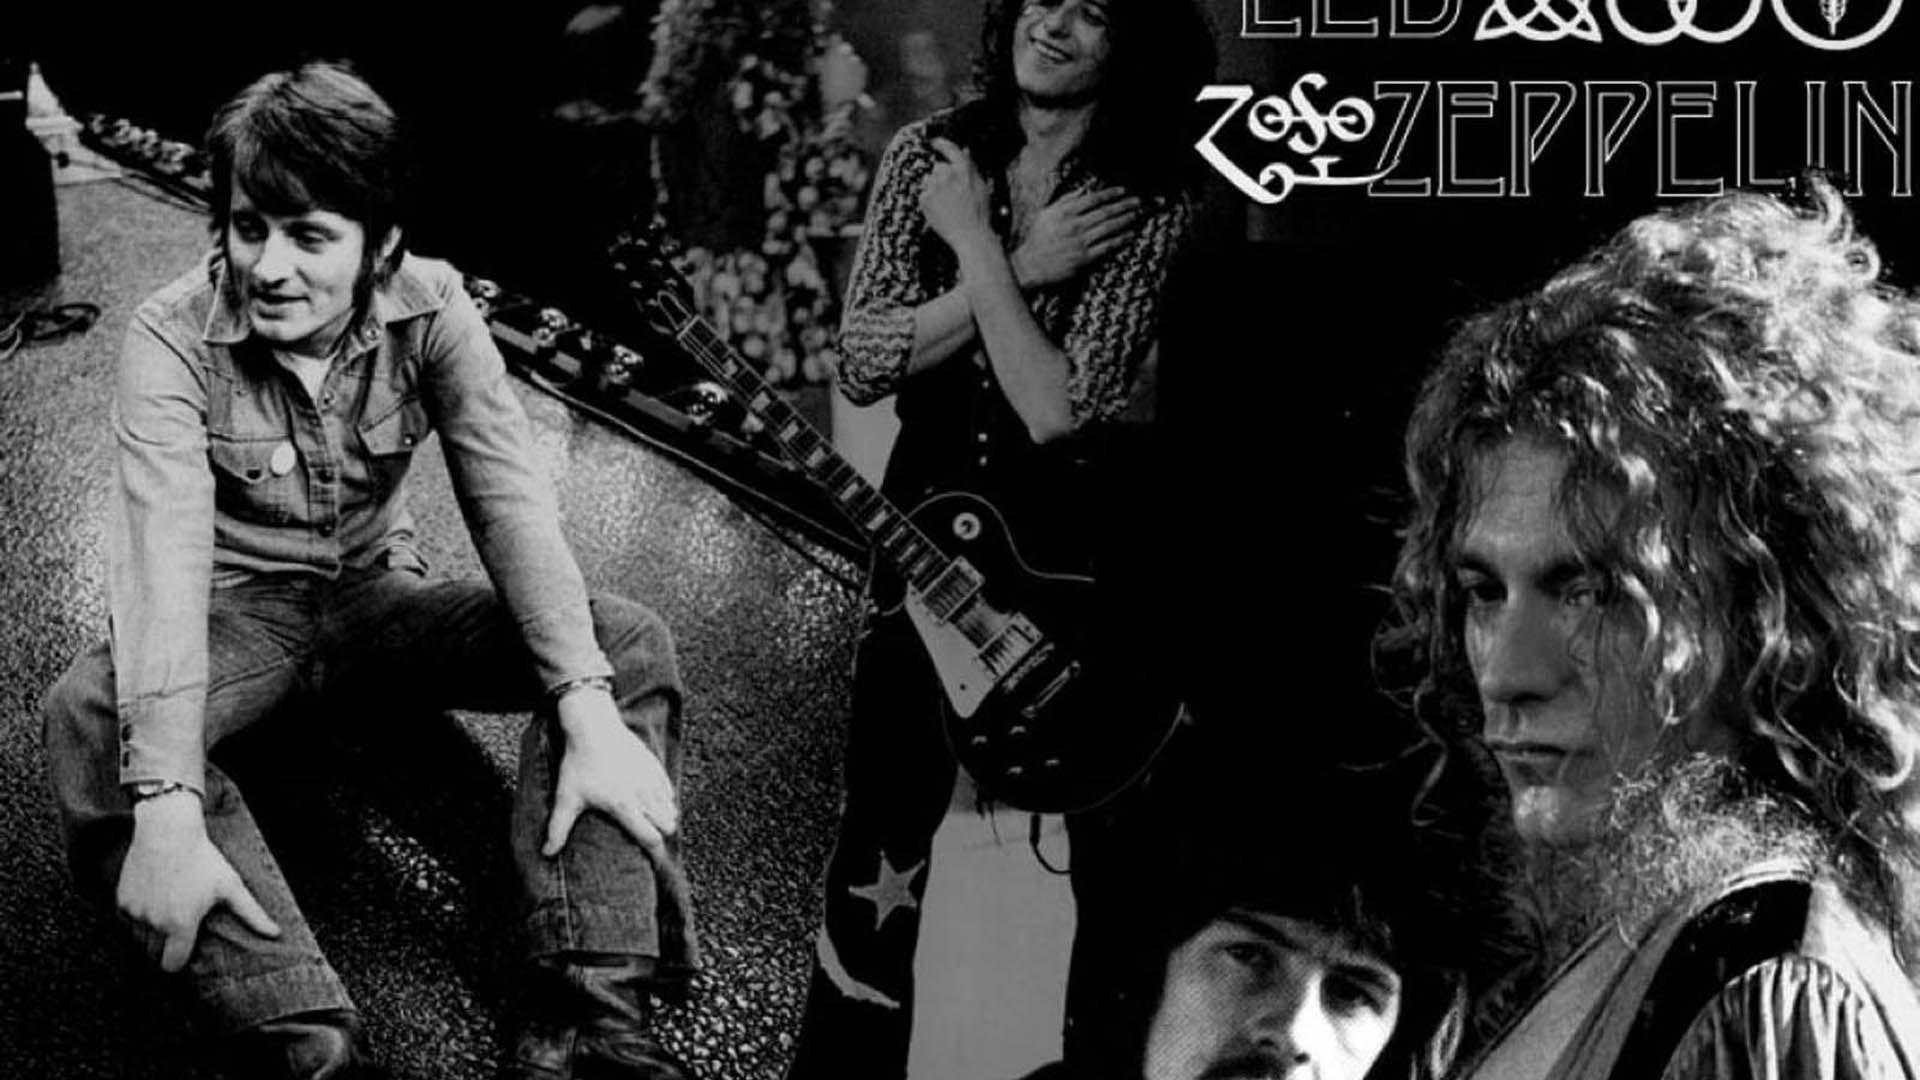 Led Zeppelin Computer Wallpaper